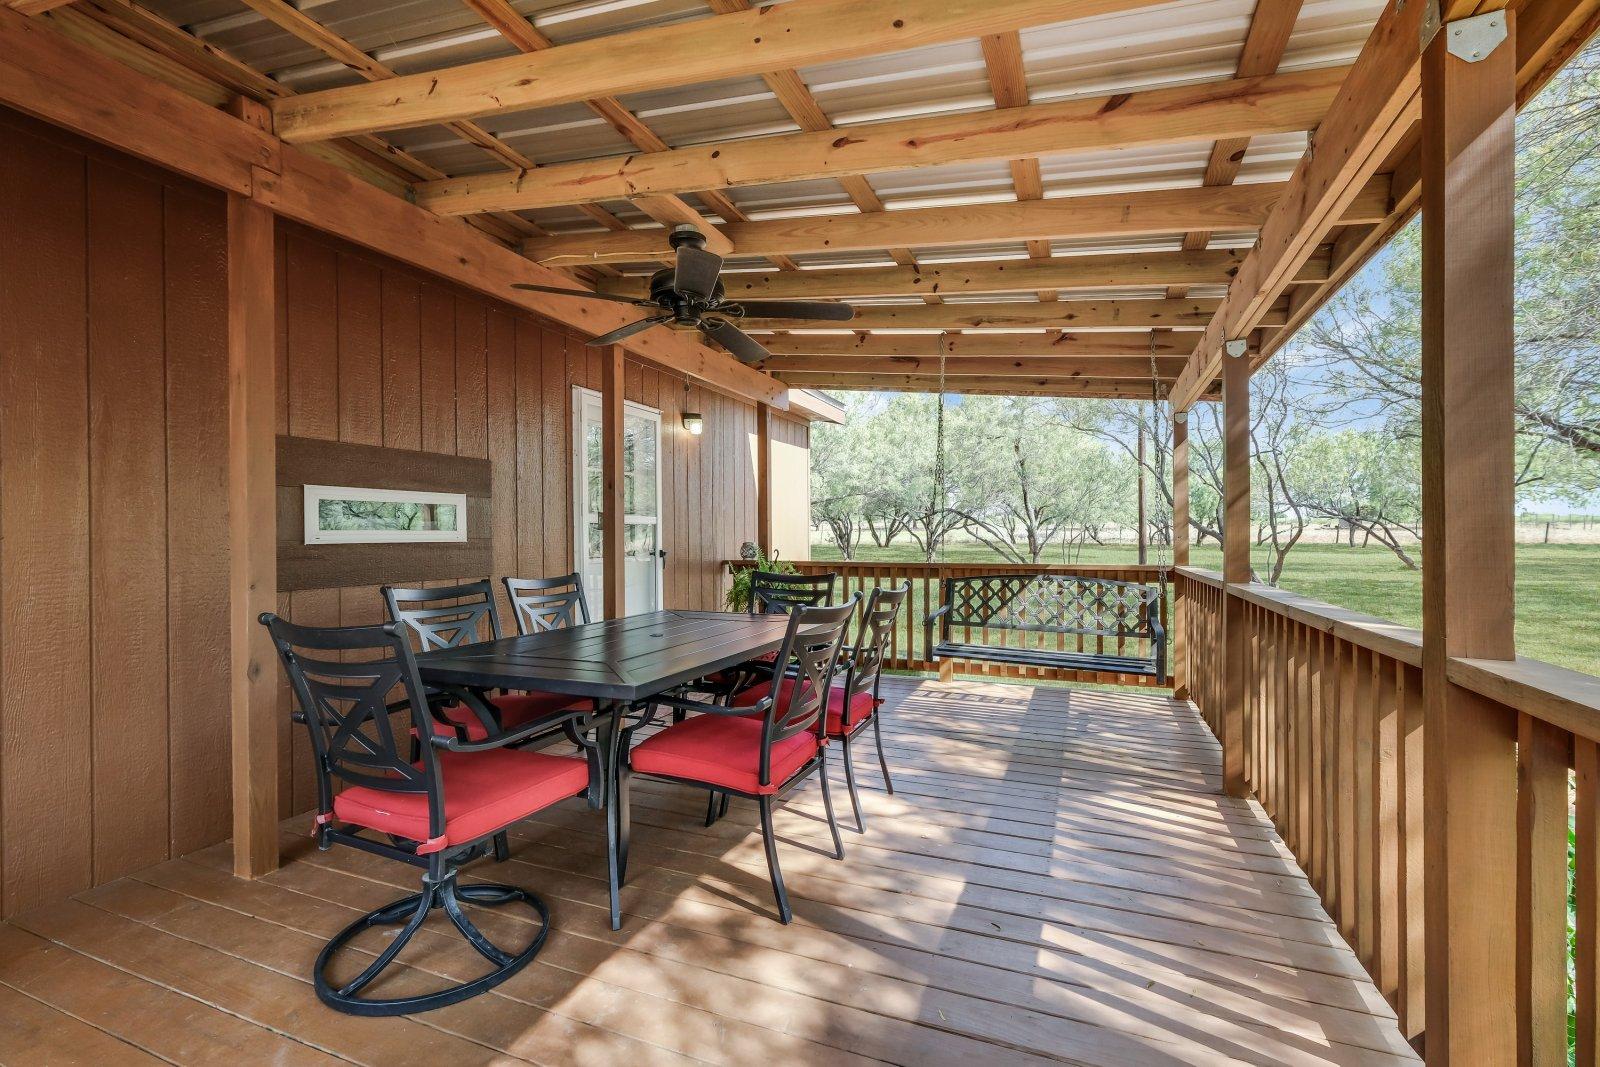 17280 Shady Falls Elmendorf TX home for sale rear deck